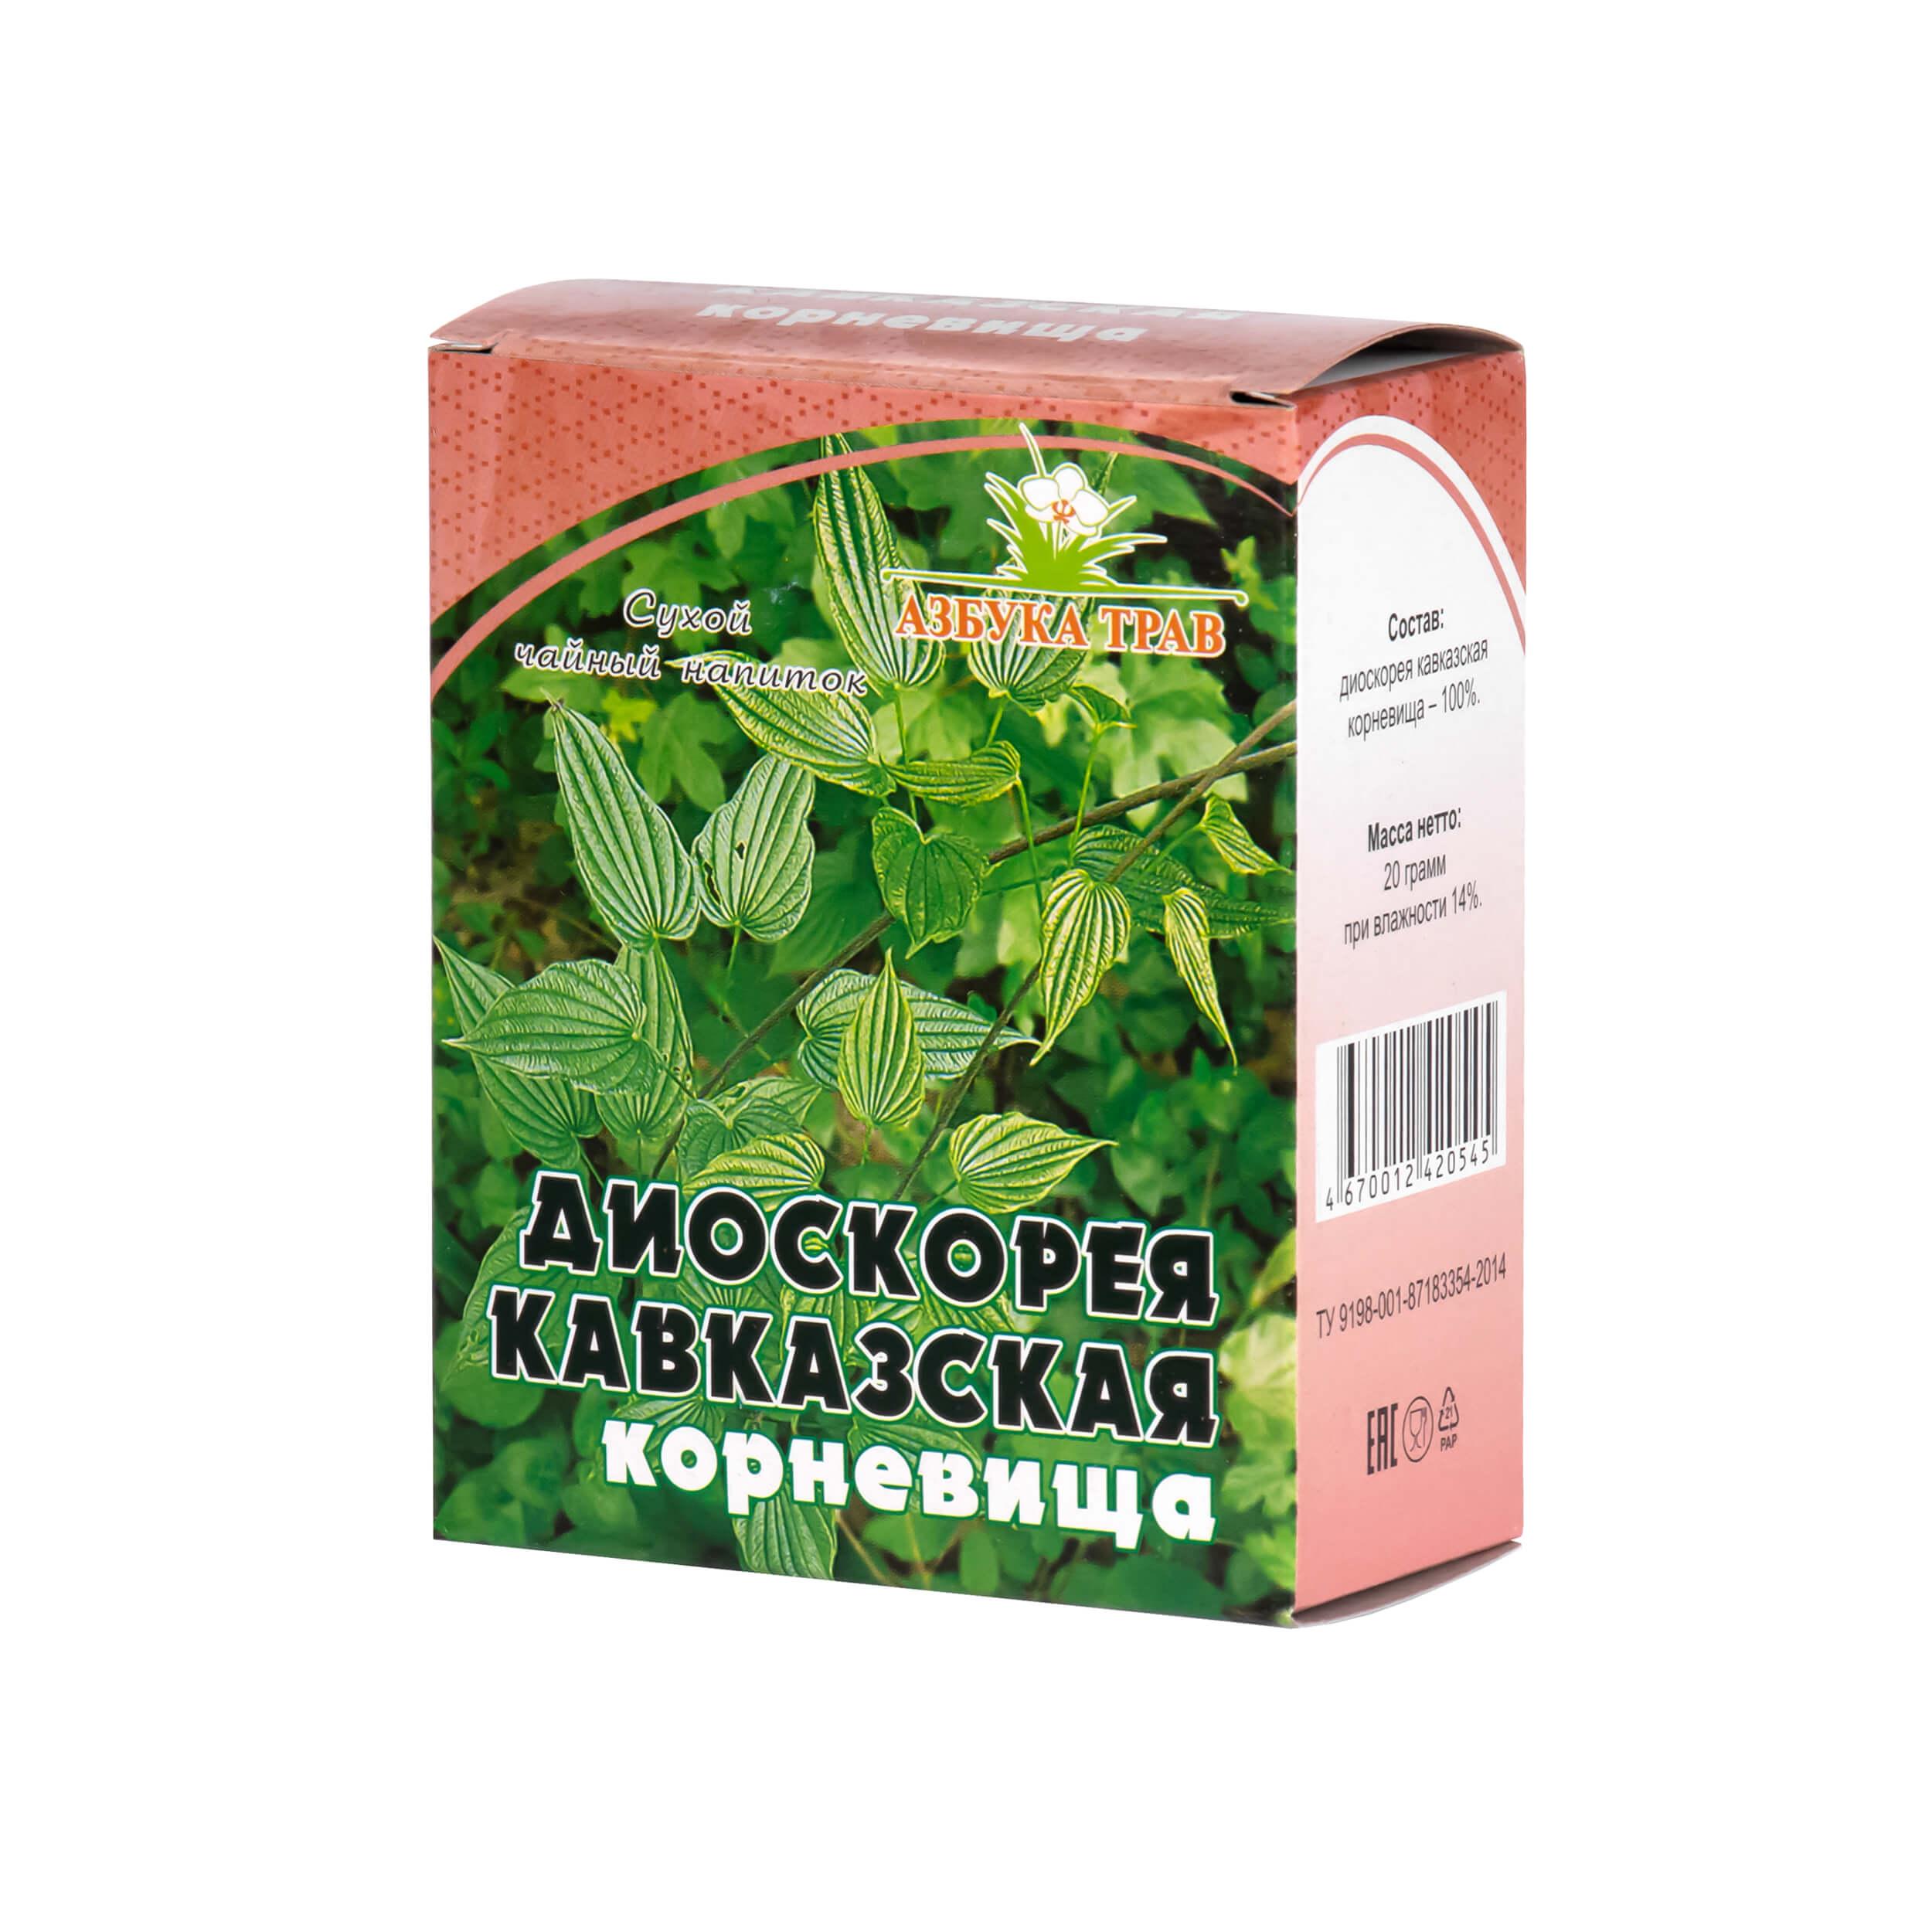 Диоскорея кавказская (корневища, 20 грамм) фото